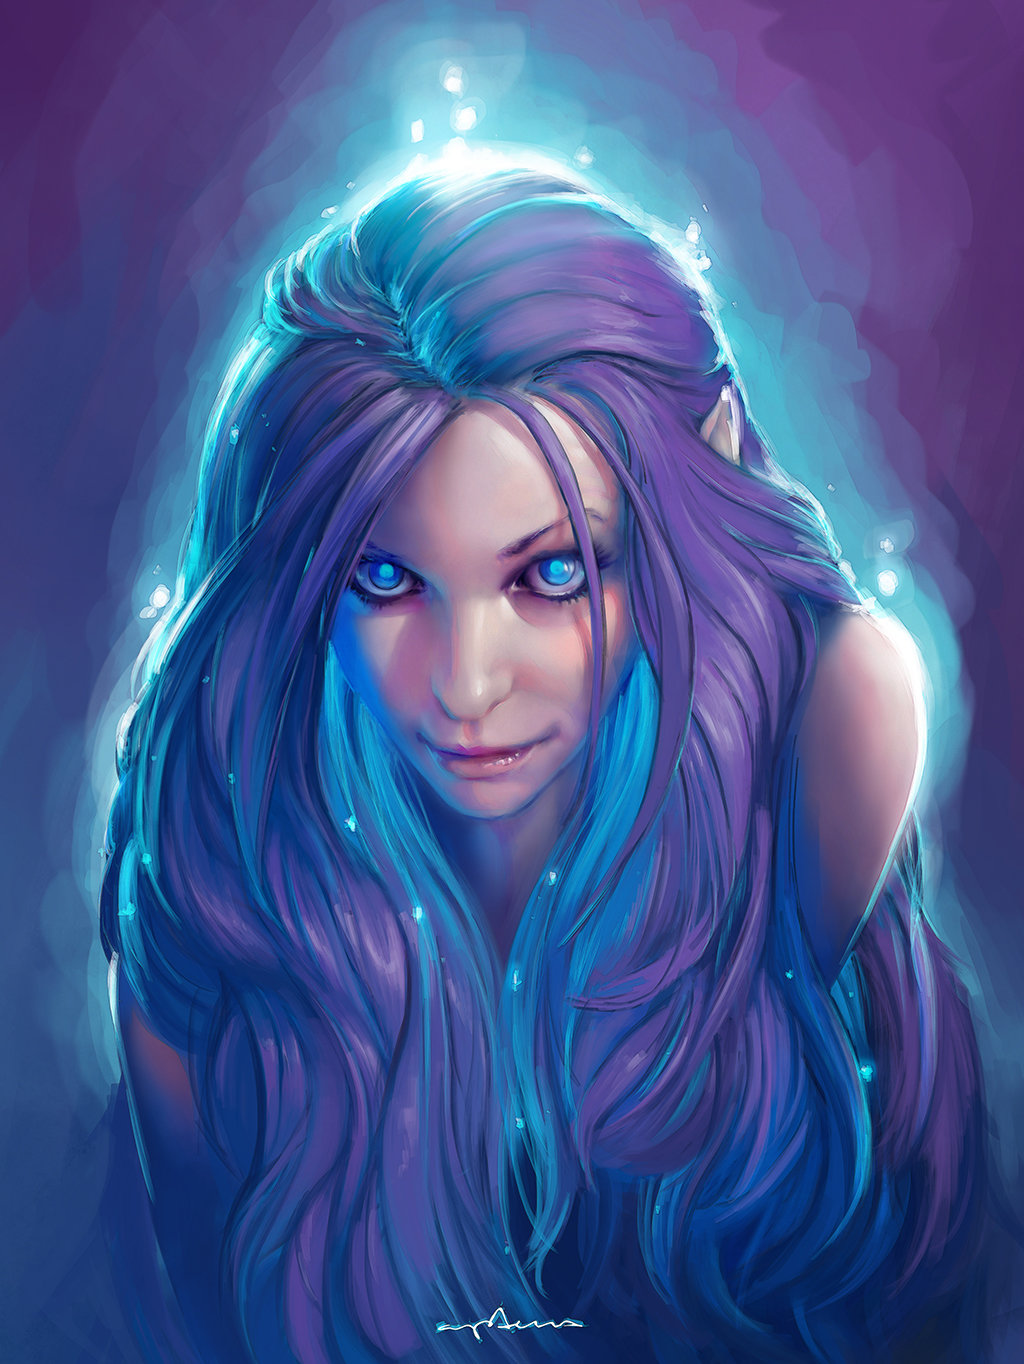 women fantasy eyes blue - photo #25